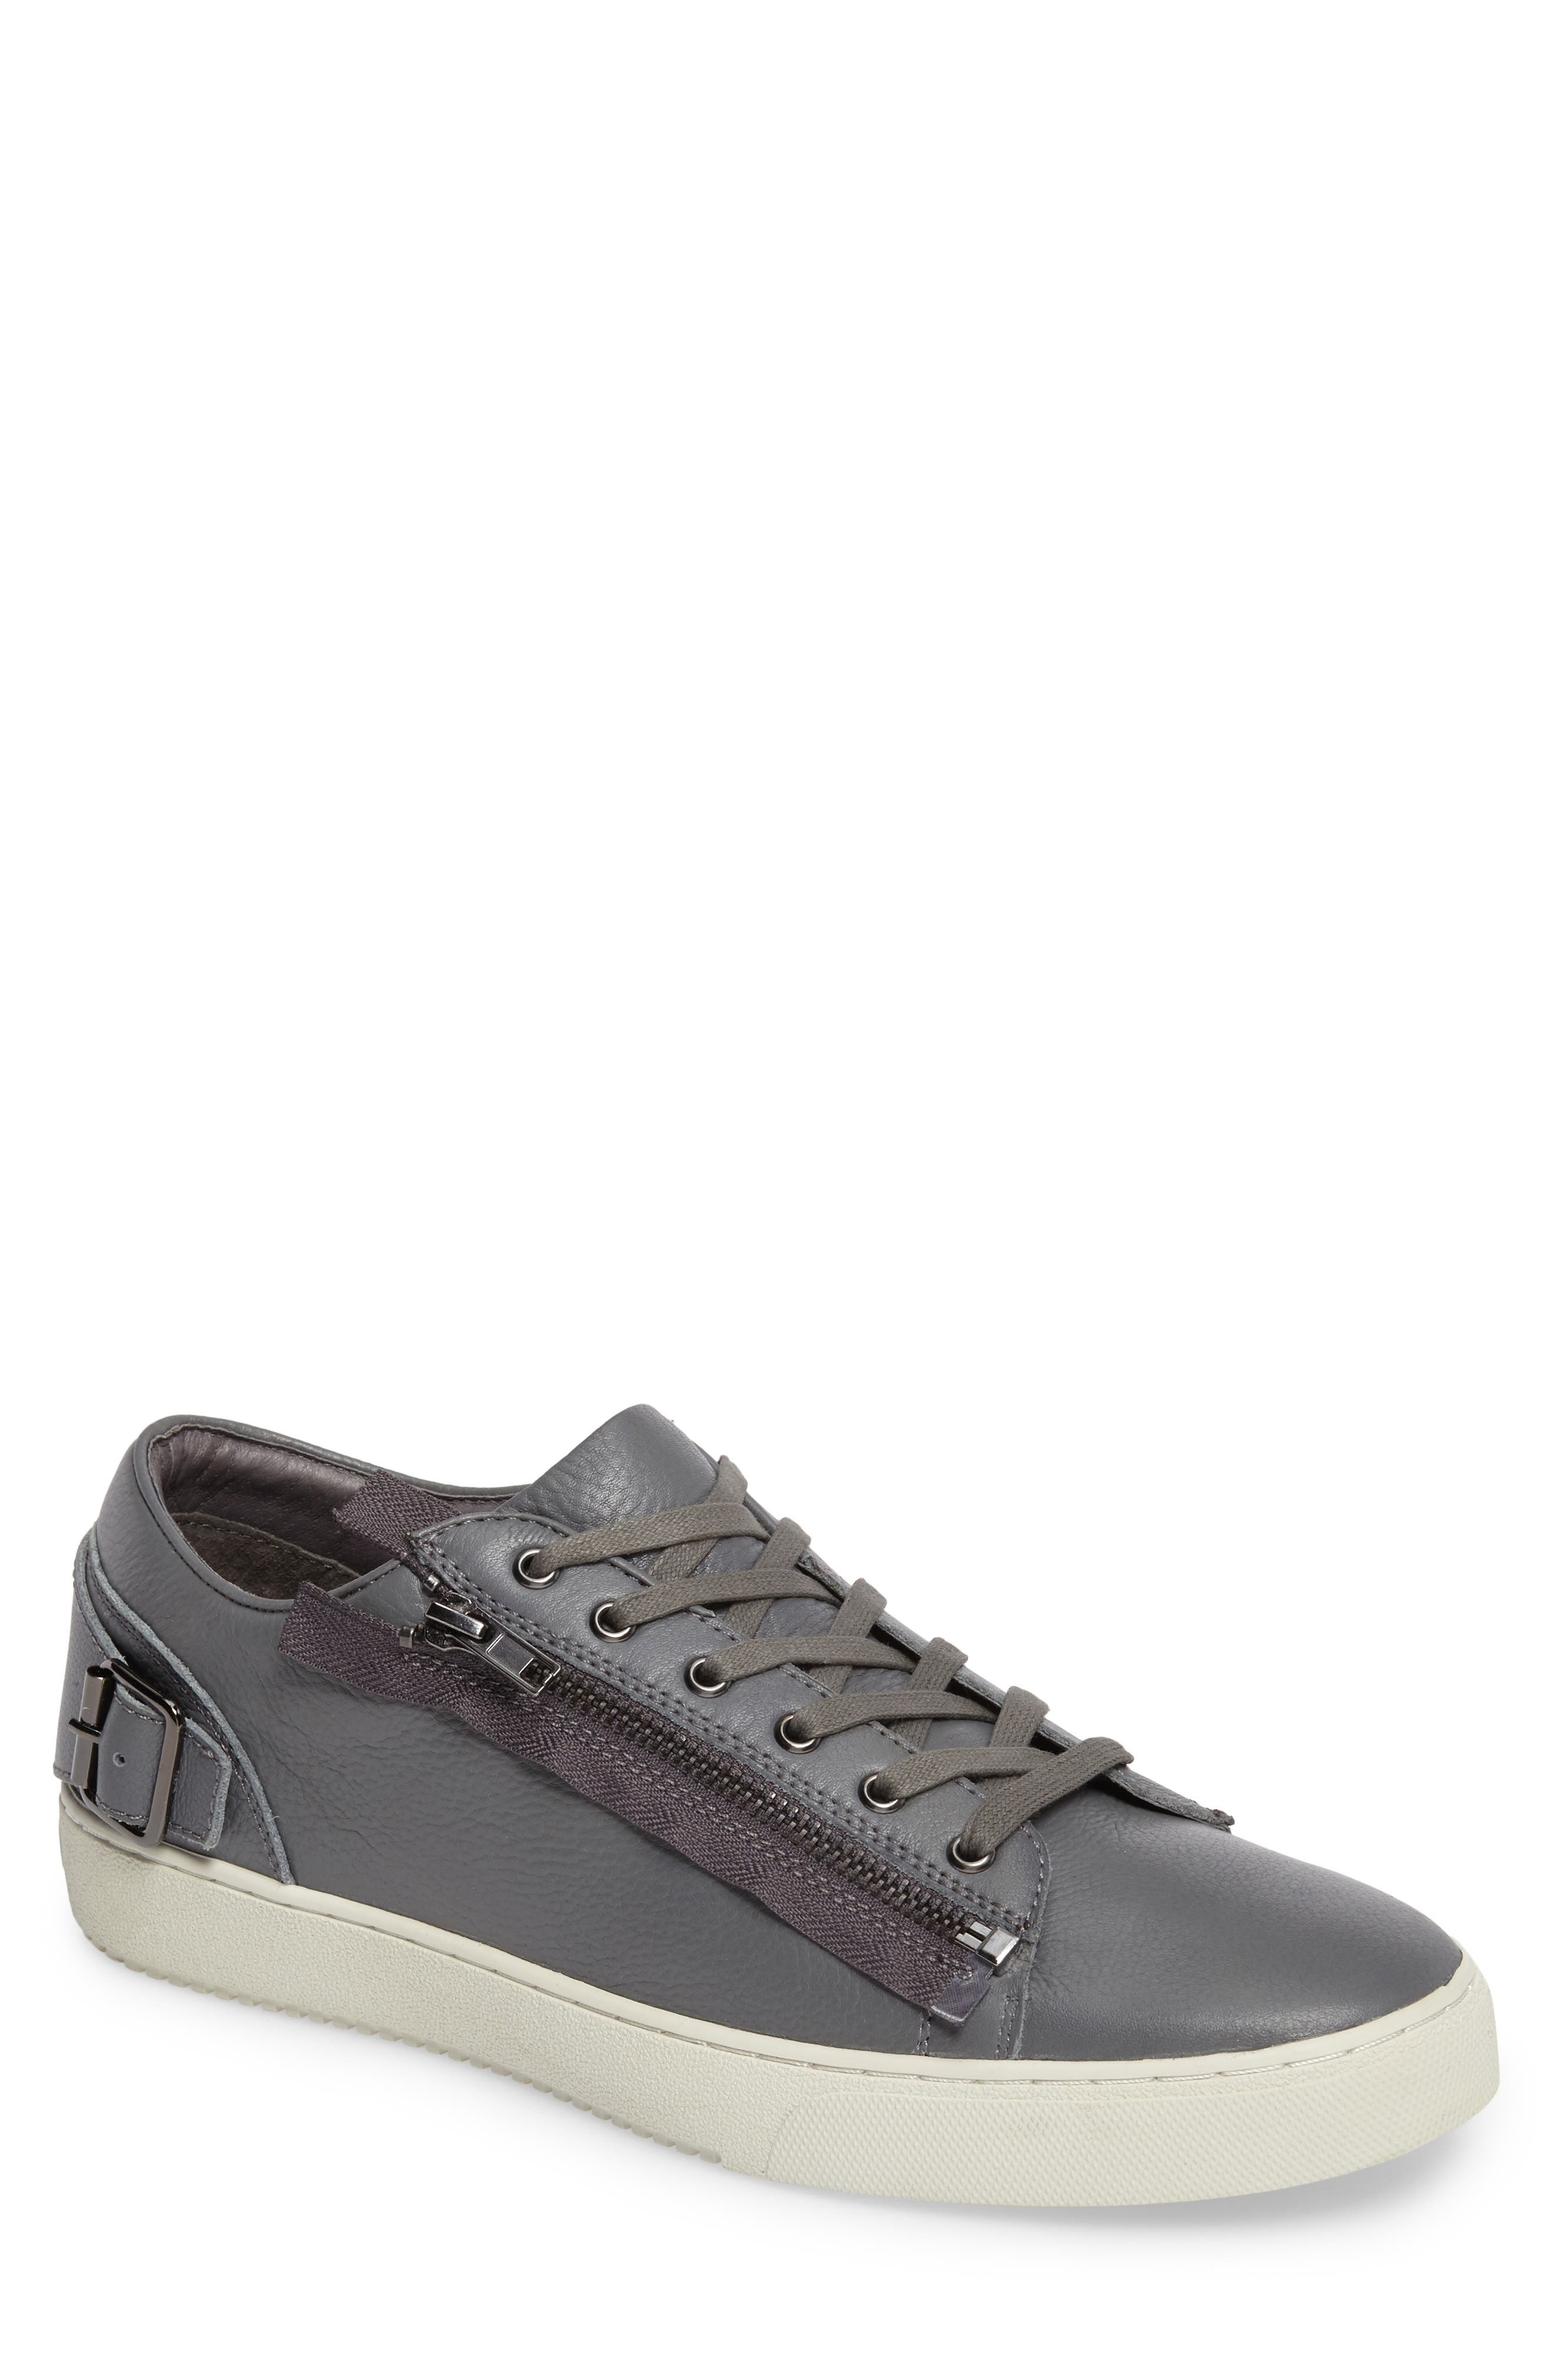 Alternate Image 1 Selected - JSlides Wayne Sneaker (Men)